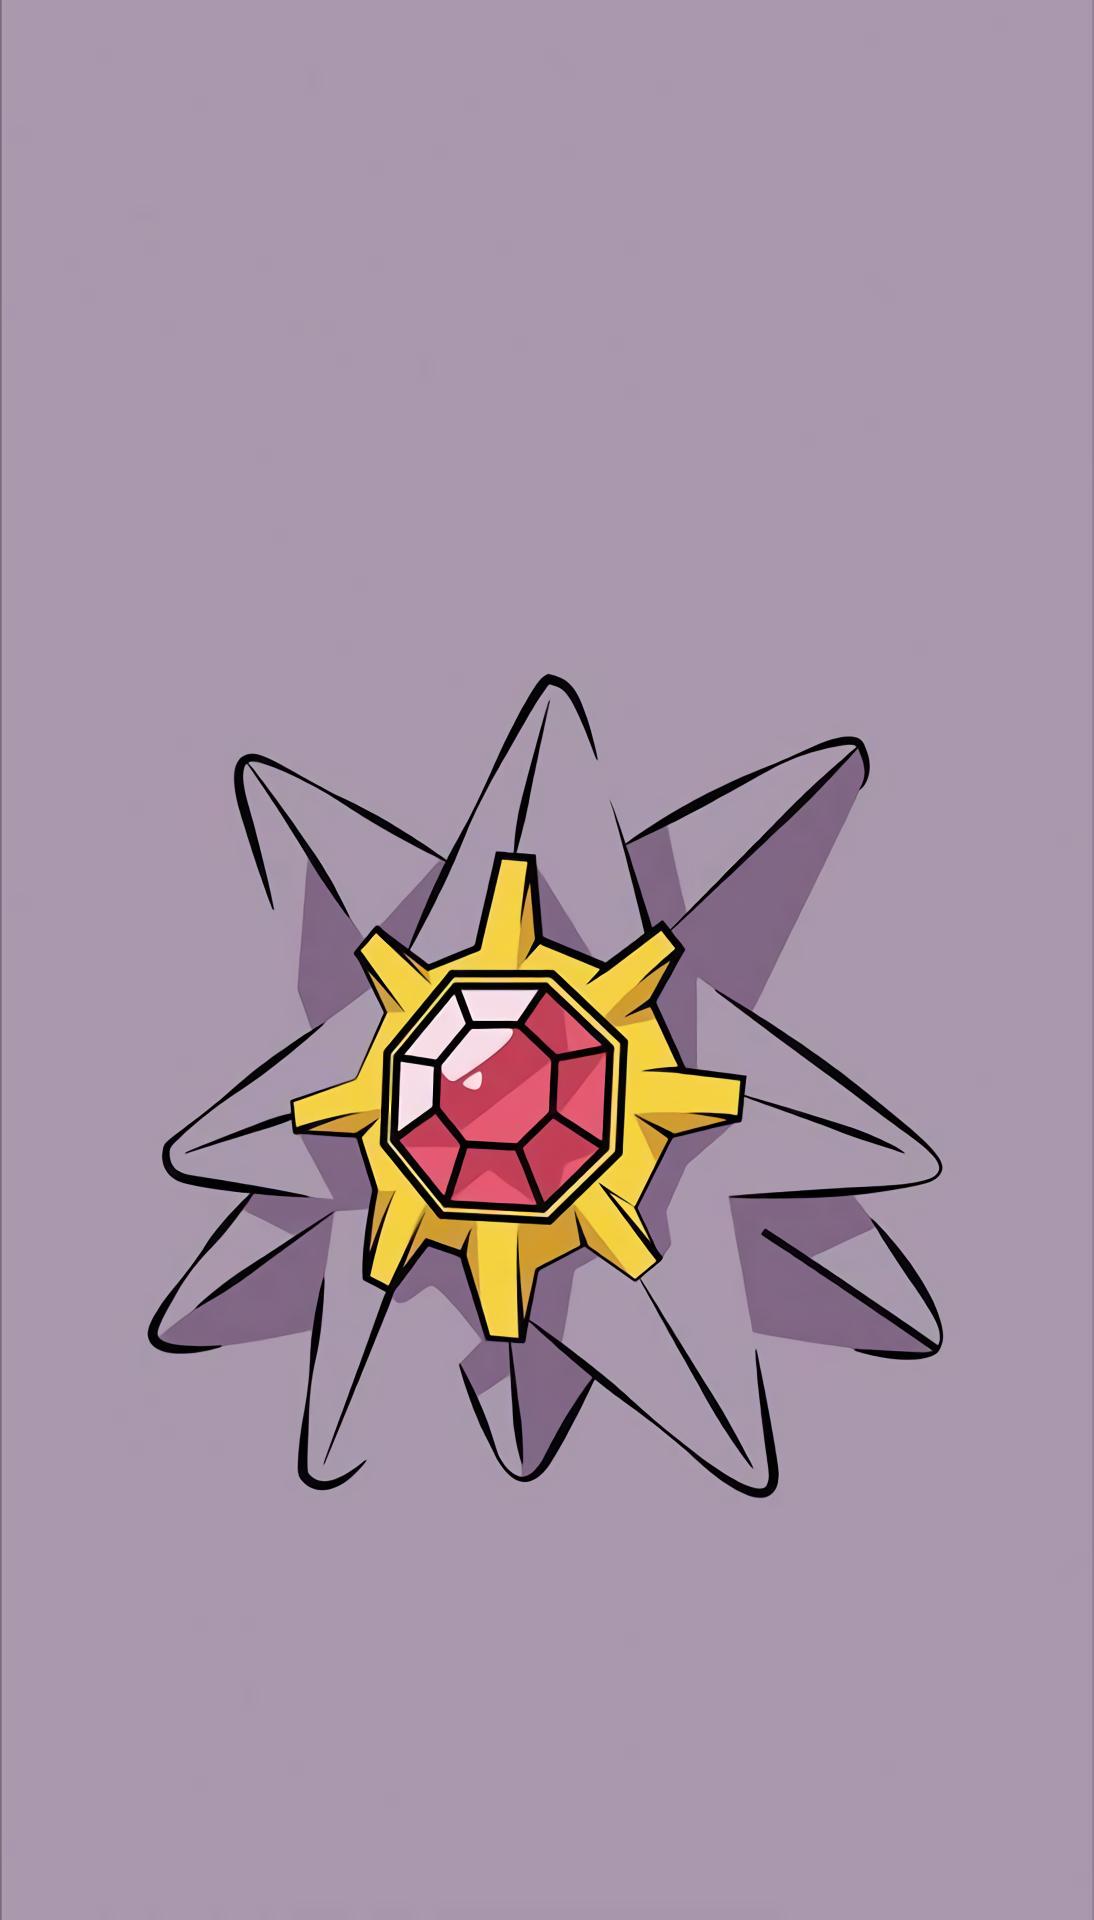 Pokémon Phone Wallpapers – Album on Imgur